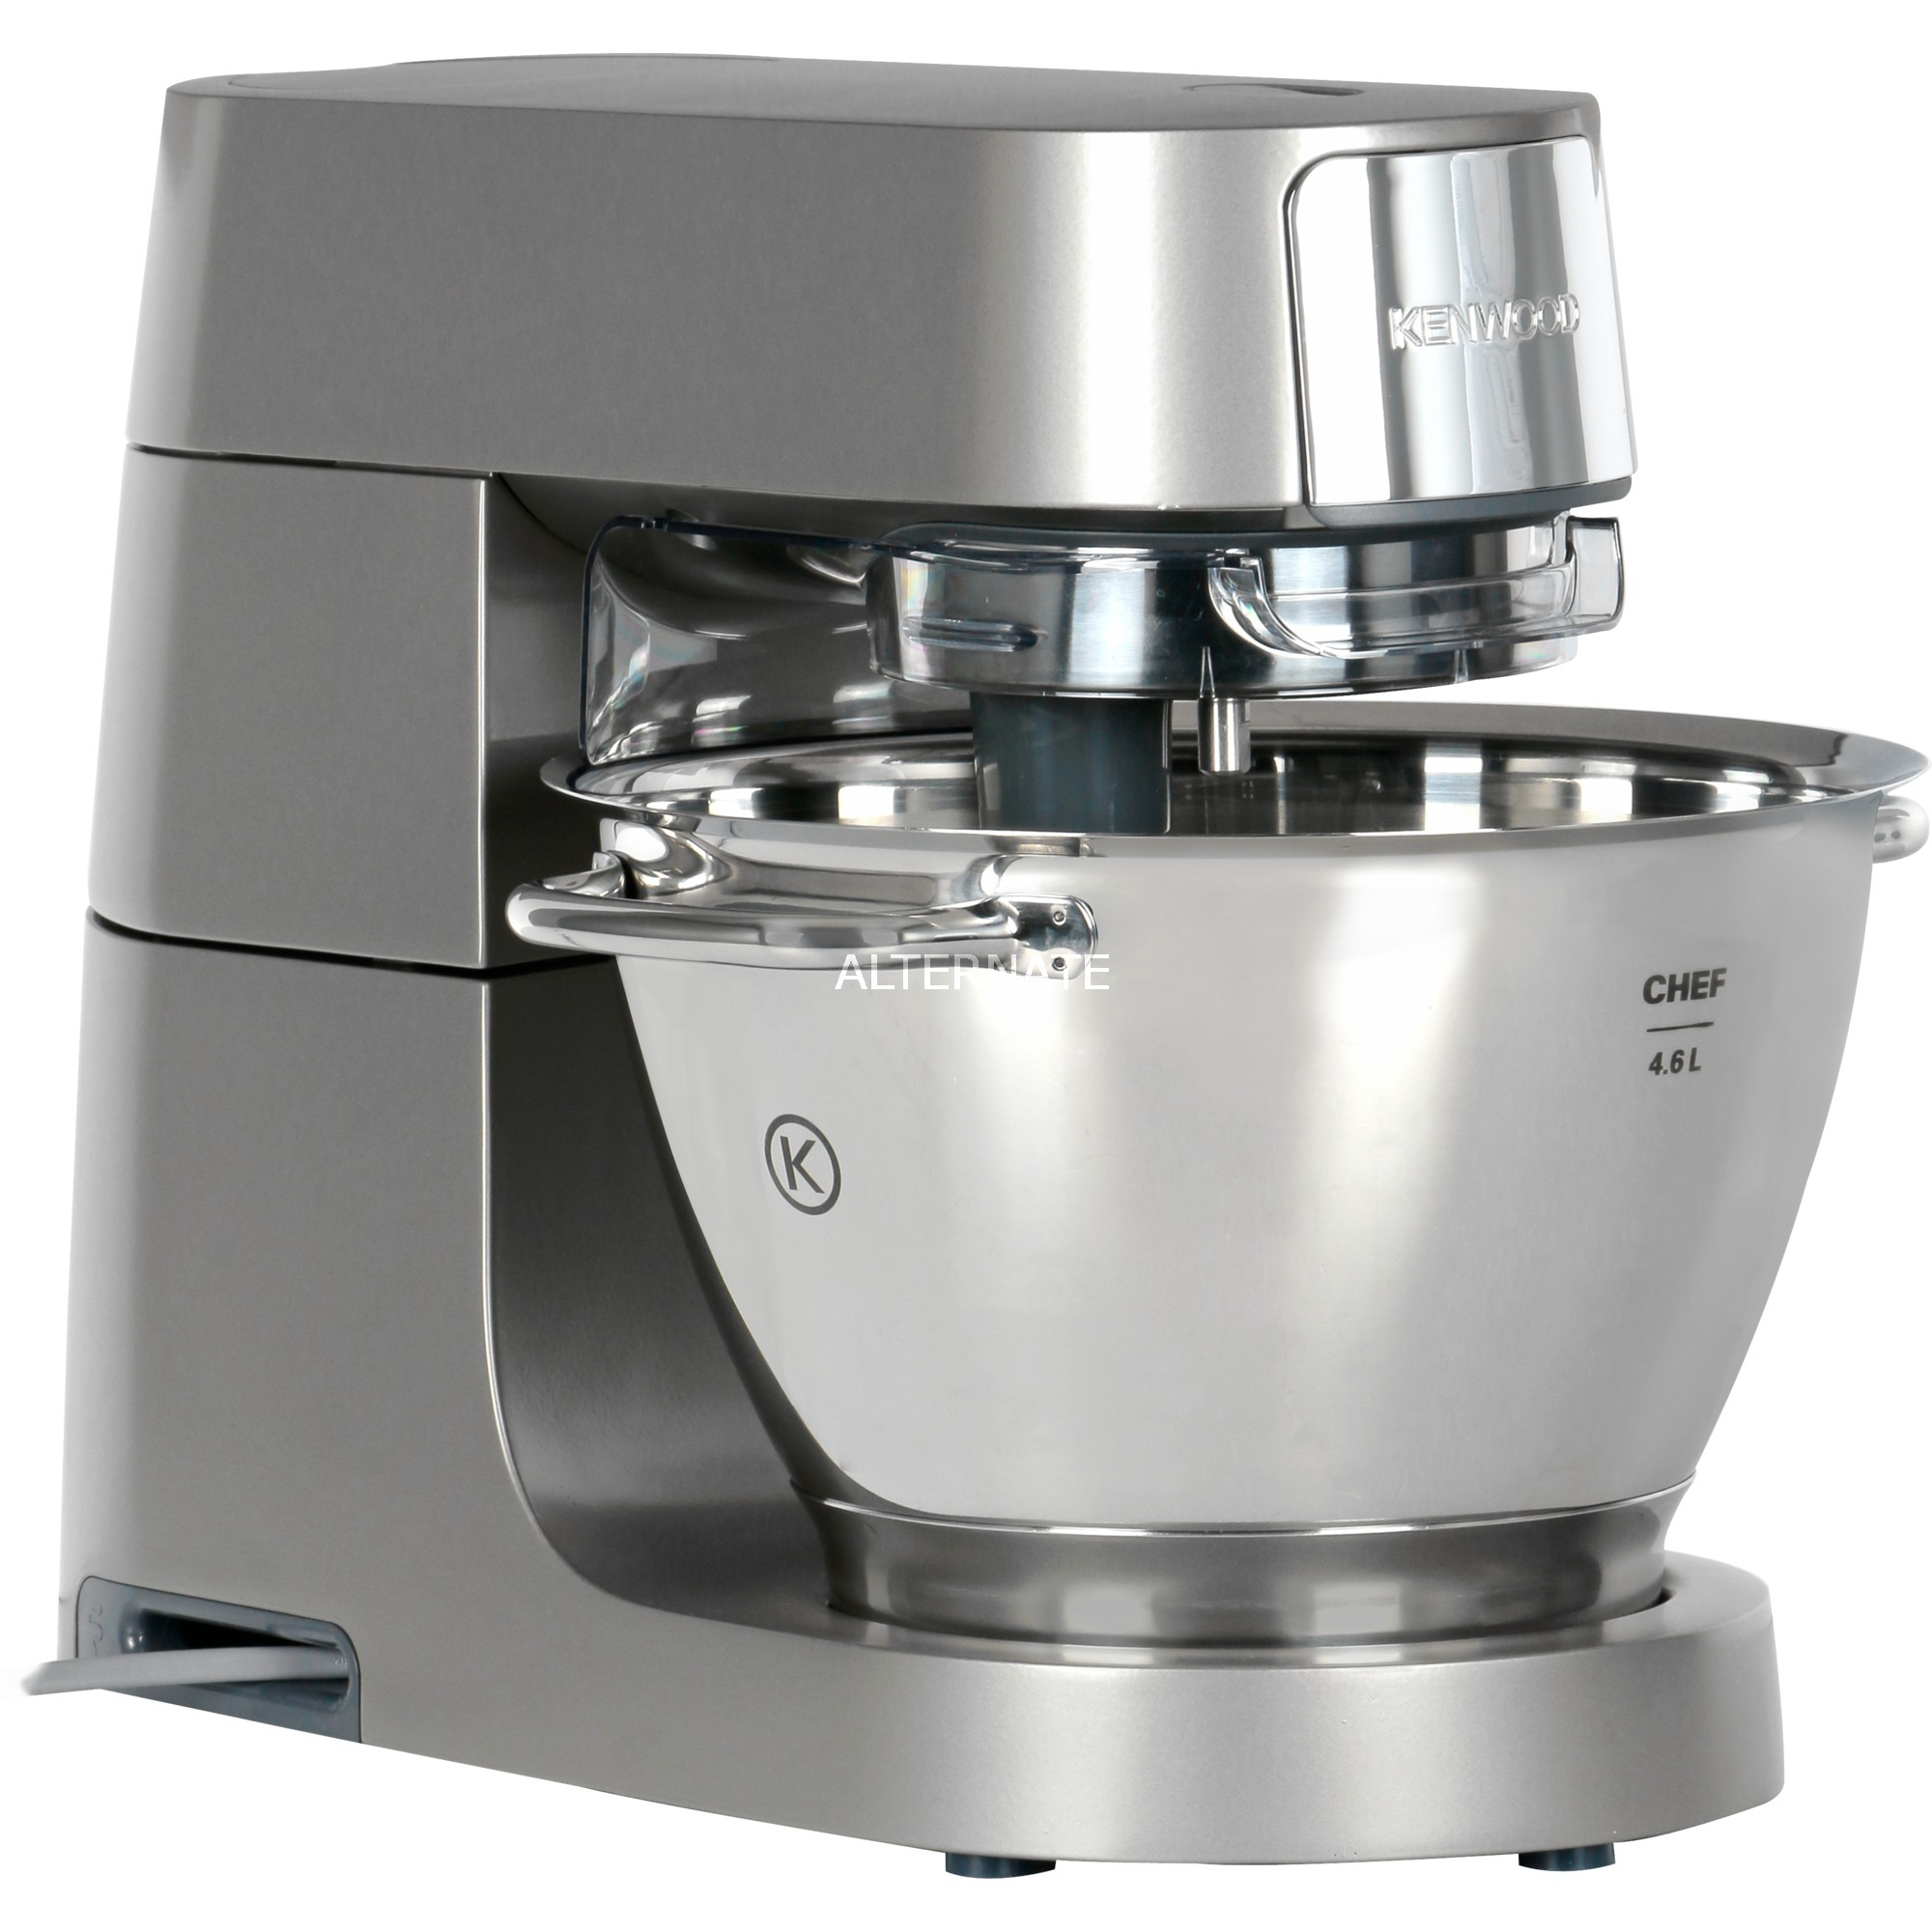 KVC7320S 1500W 4.6L Plata robot de cocina